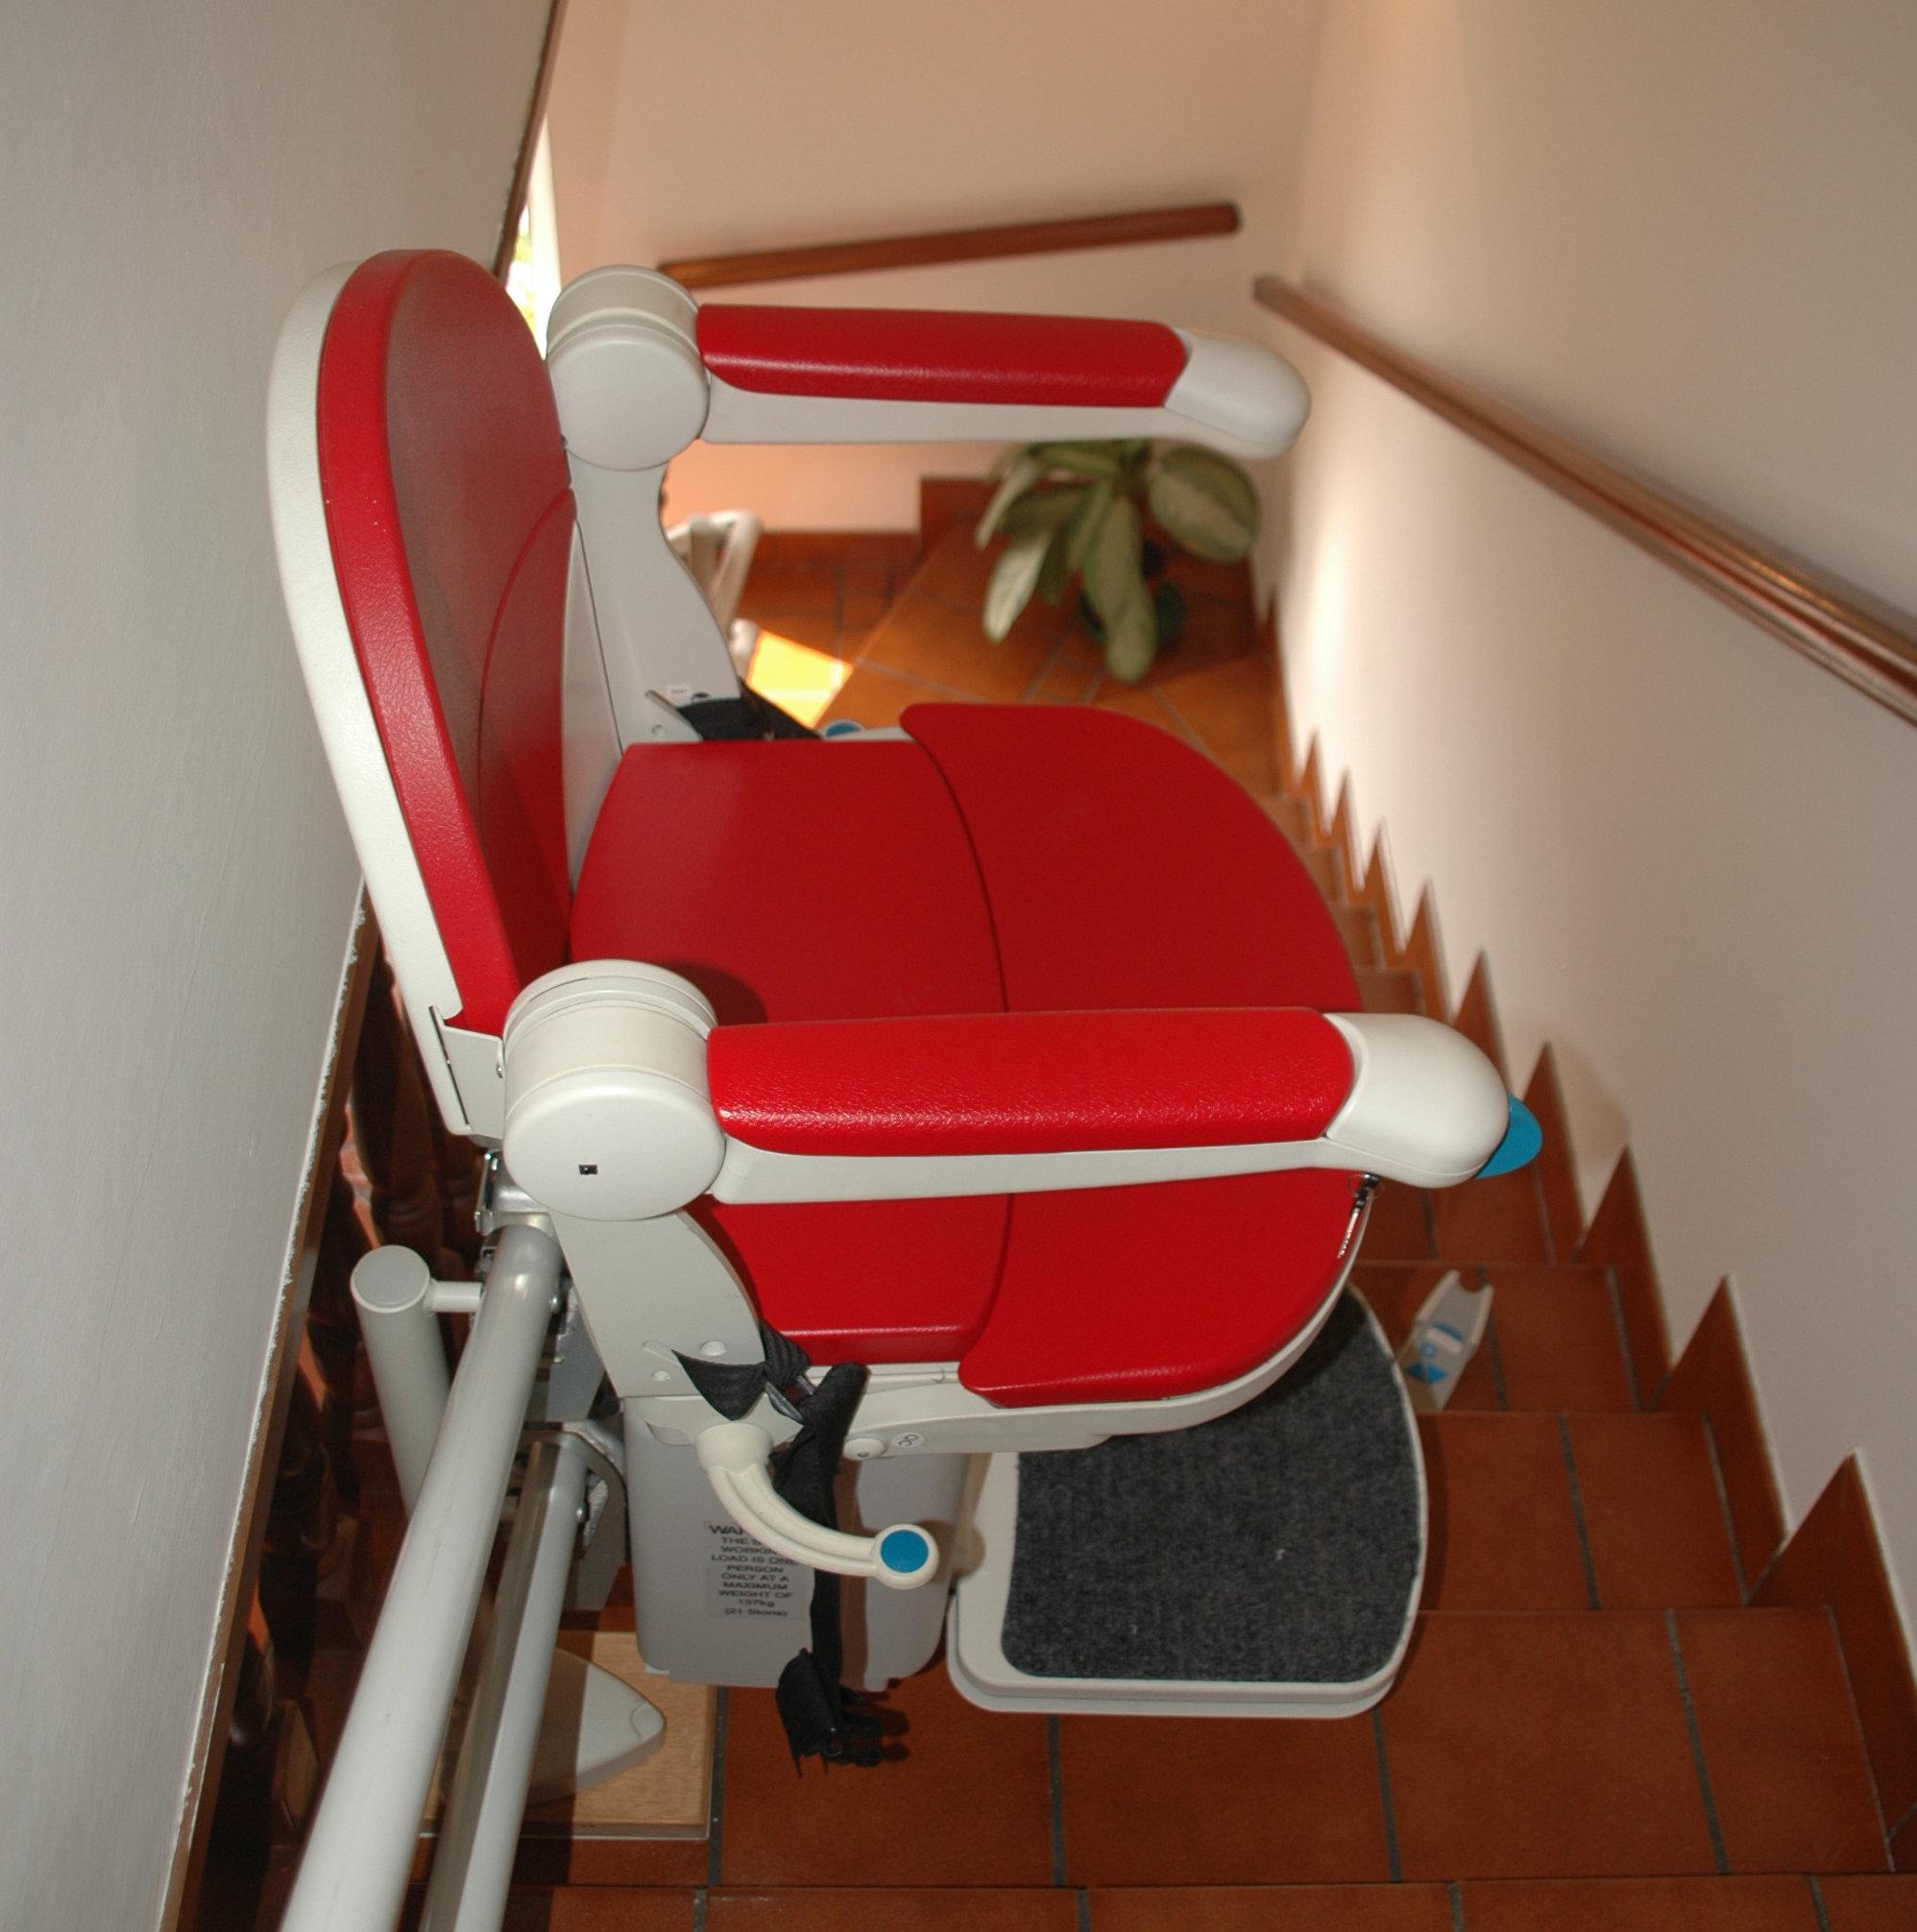 Treppenlift © babi00, stock.adobe.com